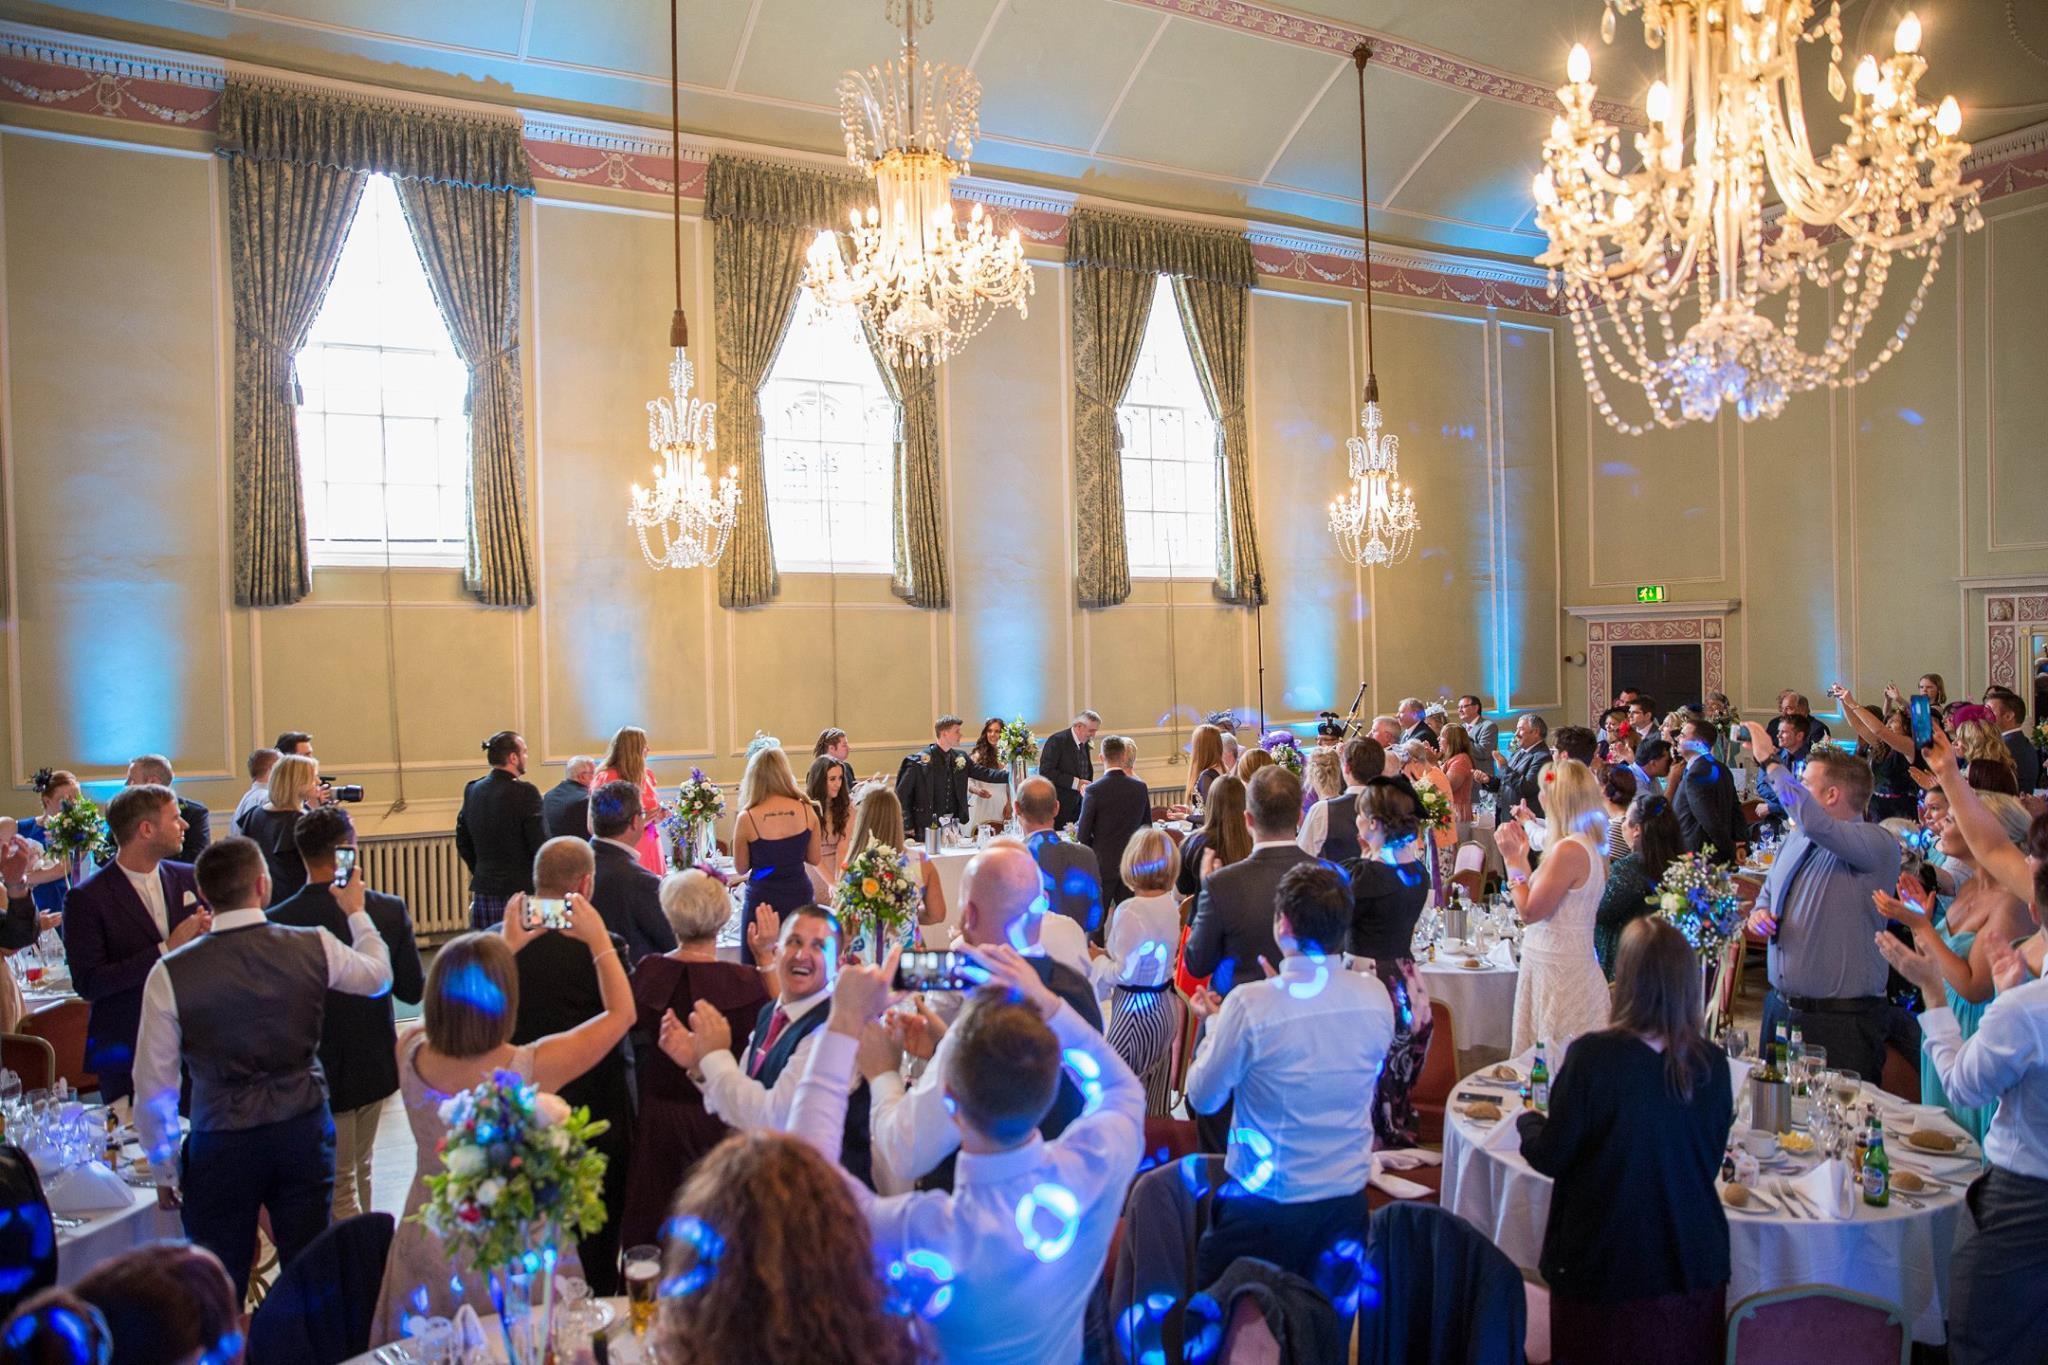 Uplighting Wedding Venue Decor Mood Lighting Hire Blacktiedj